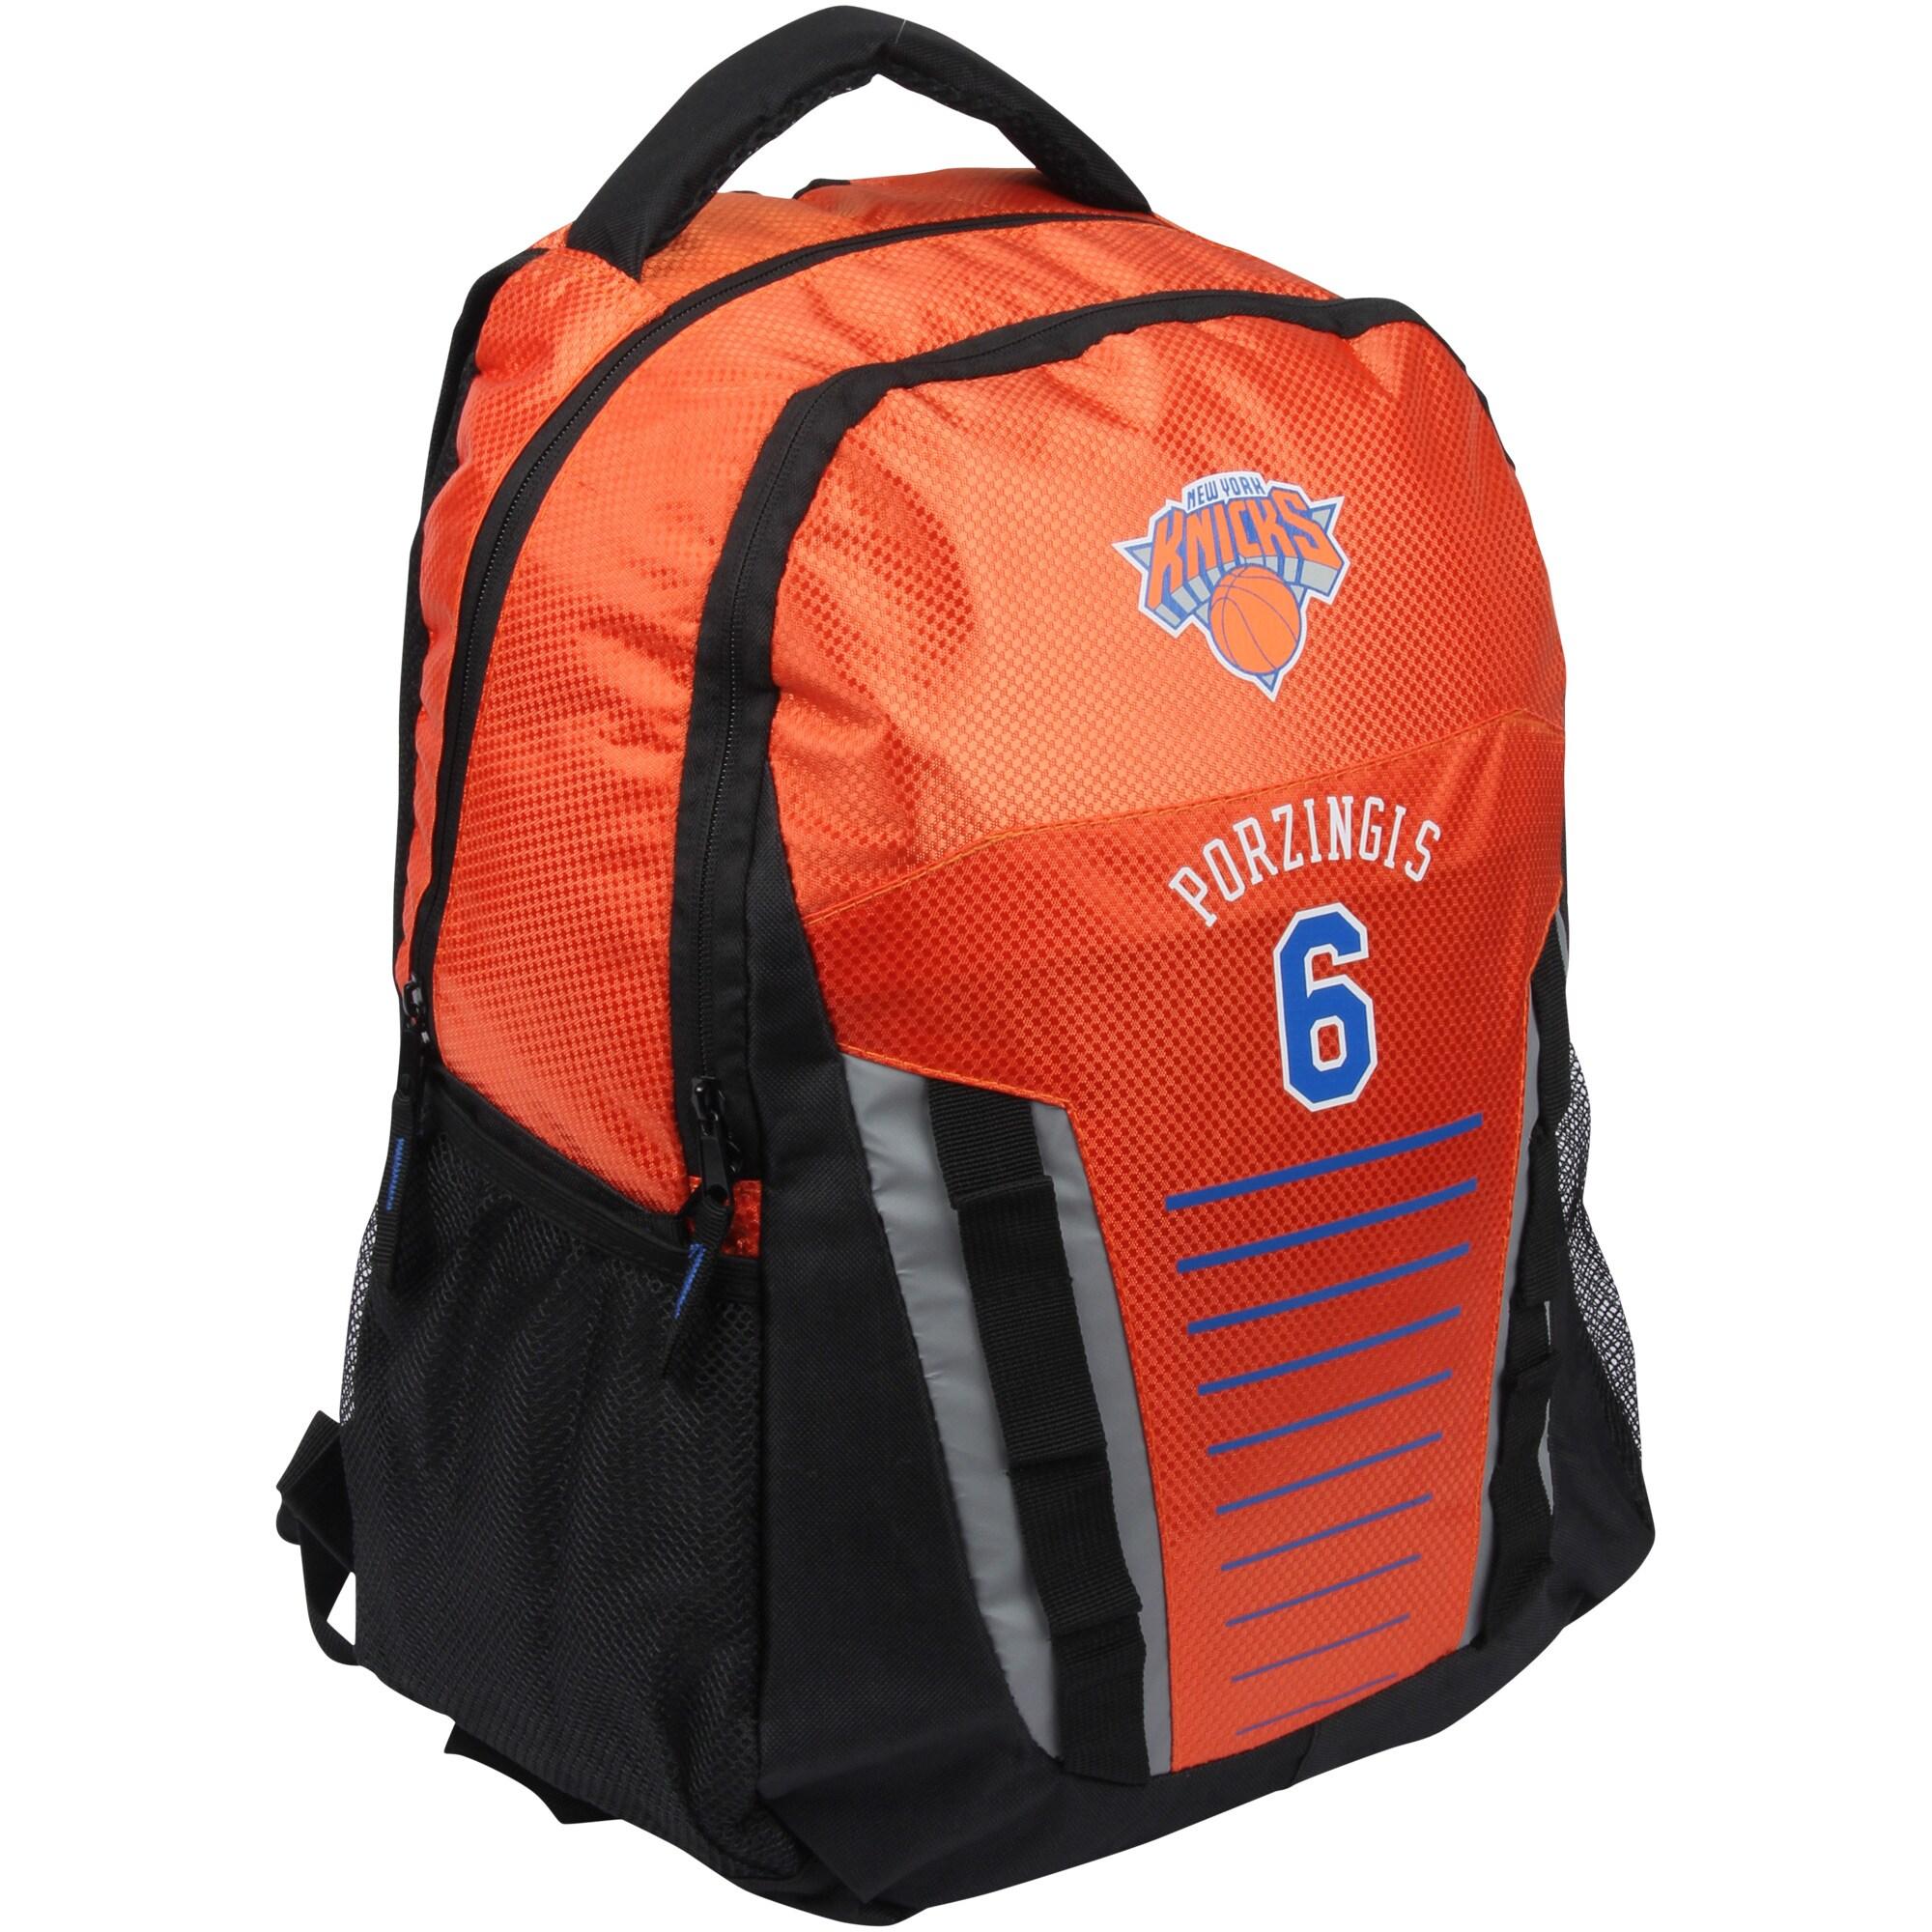 Kristaps Porzingis New York Knicks Player Franchise Backpack - Orange